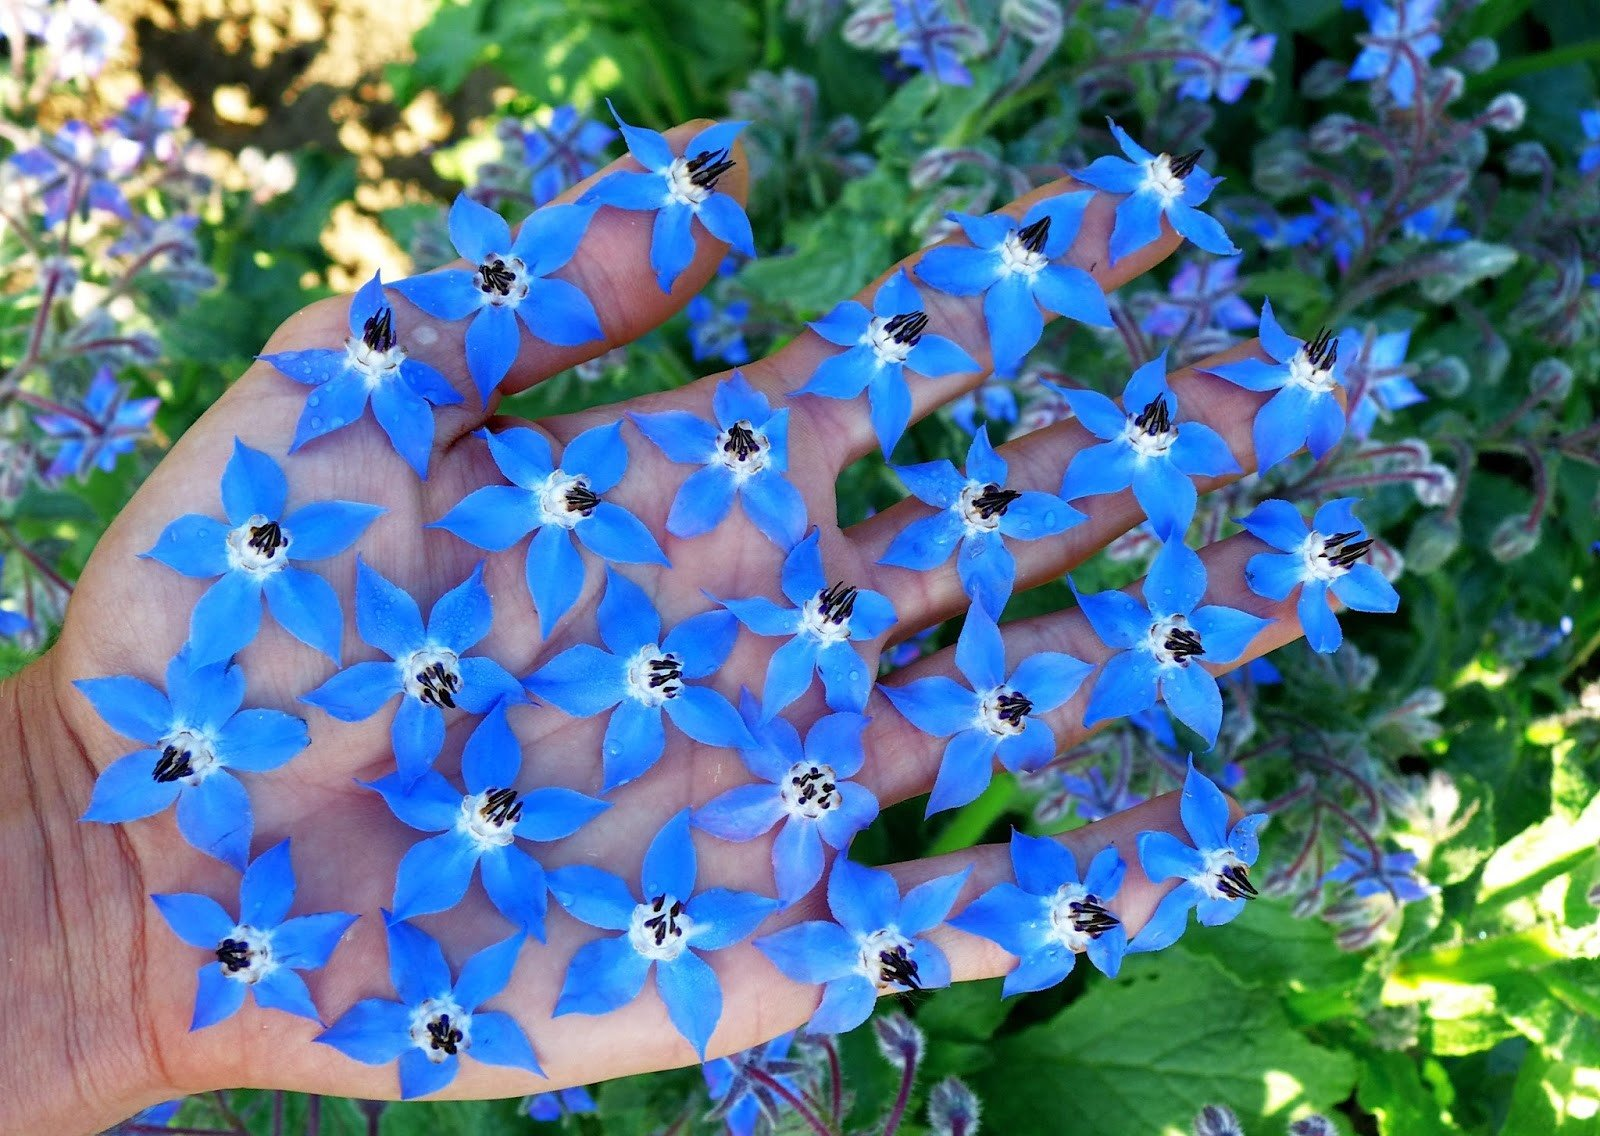 Цветы с синими цветами : названия, описание, фото 24